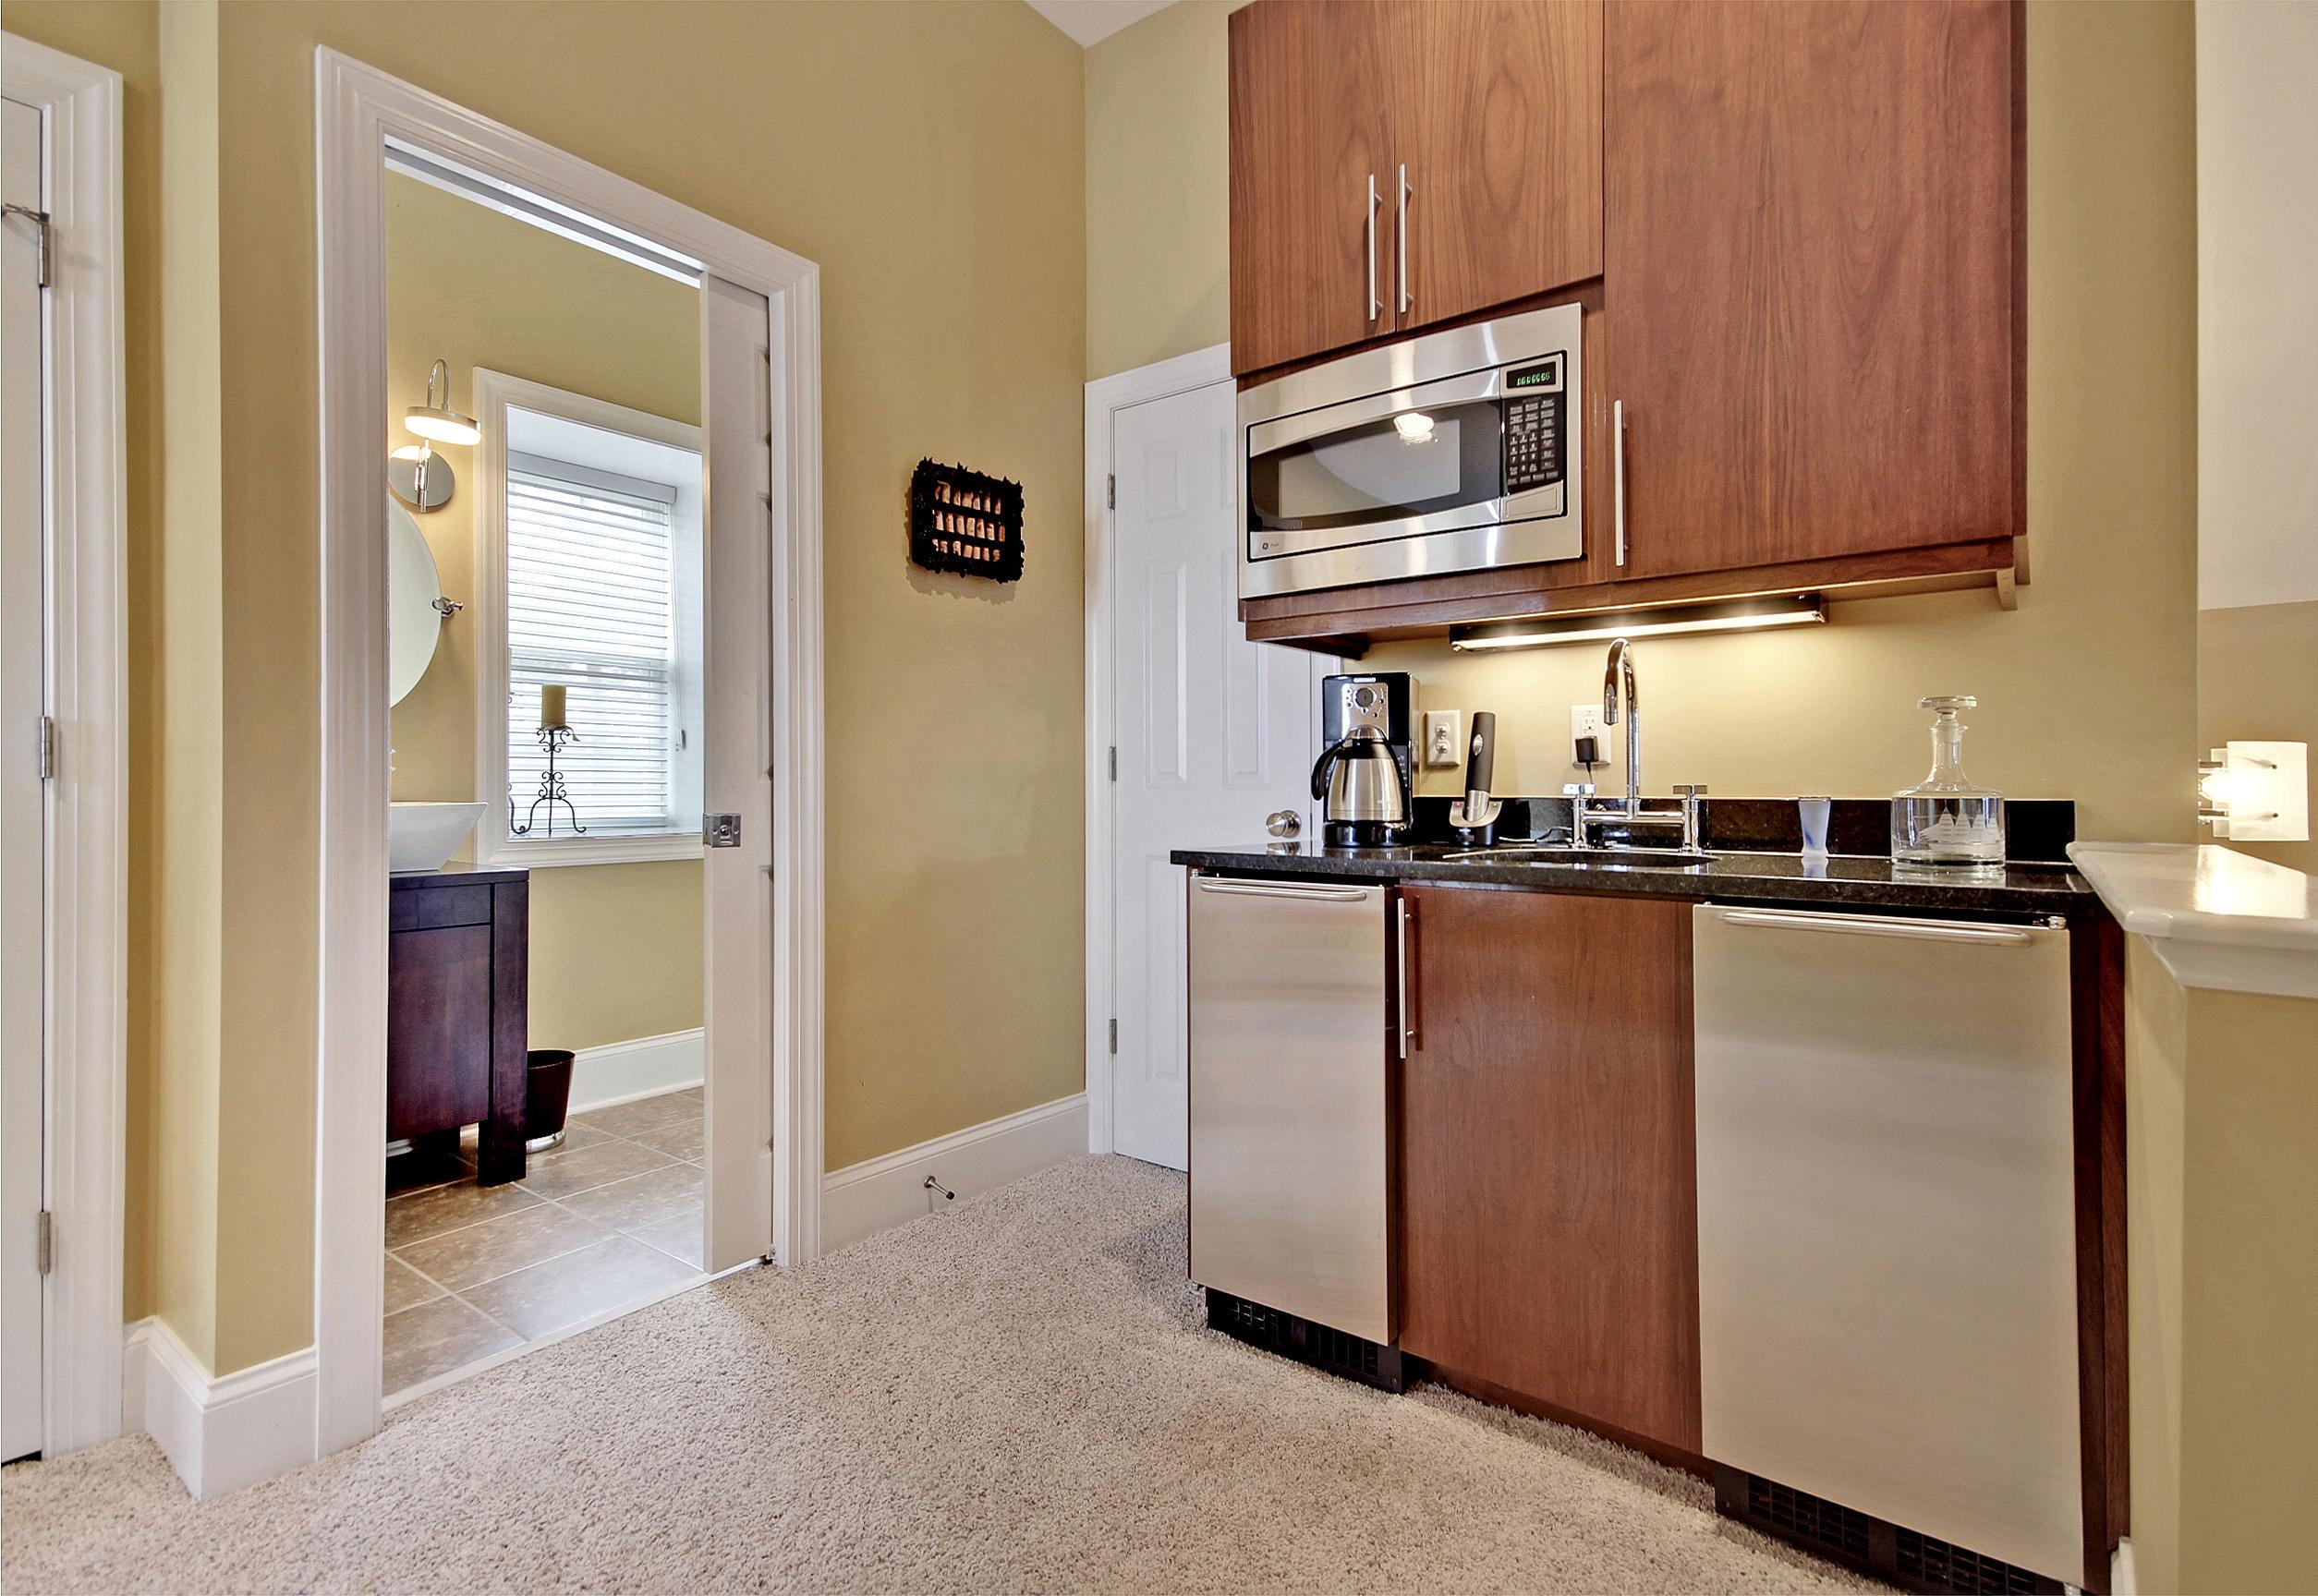 Dunes West Homes For Sale - 2364 Darts Cove, Mount Pleasant, SC - 9